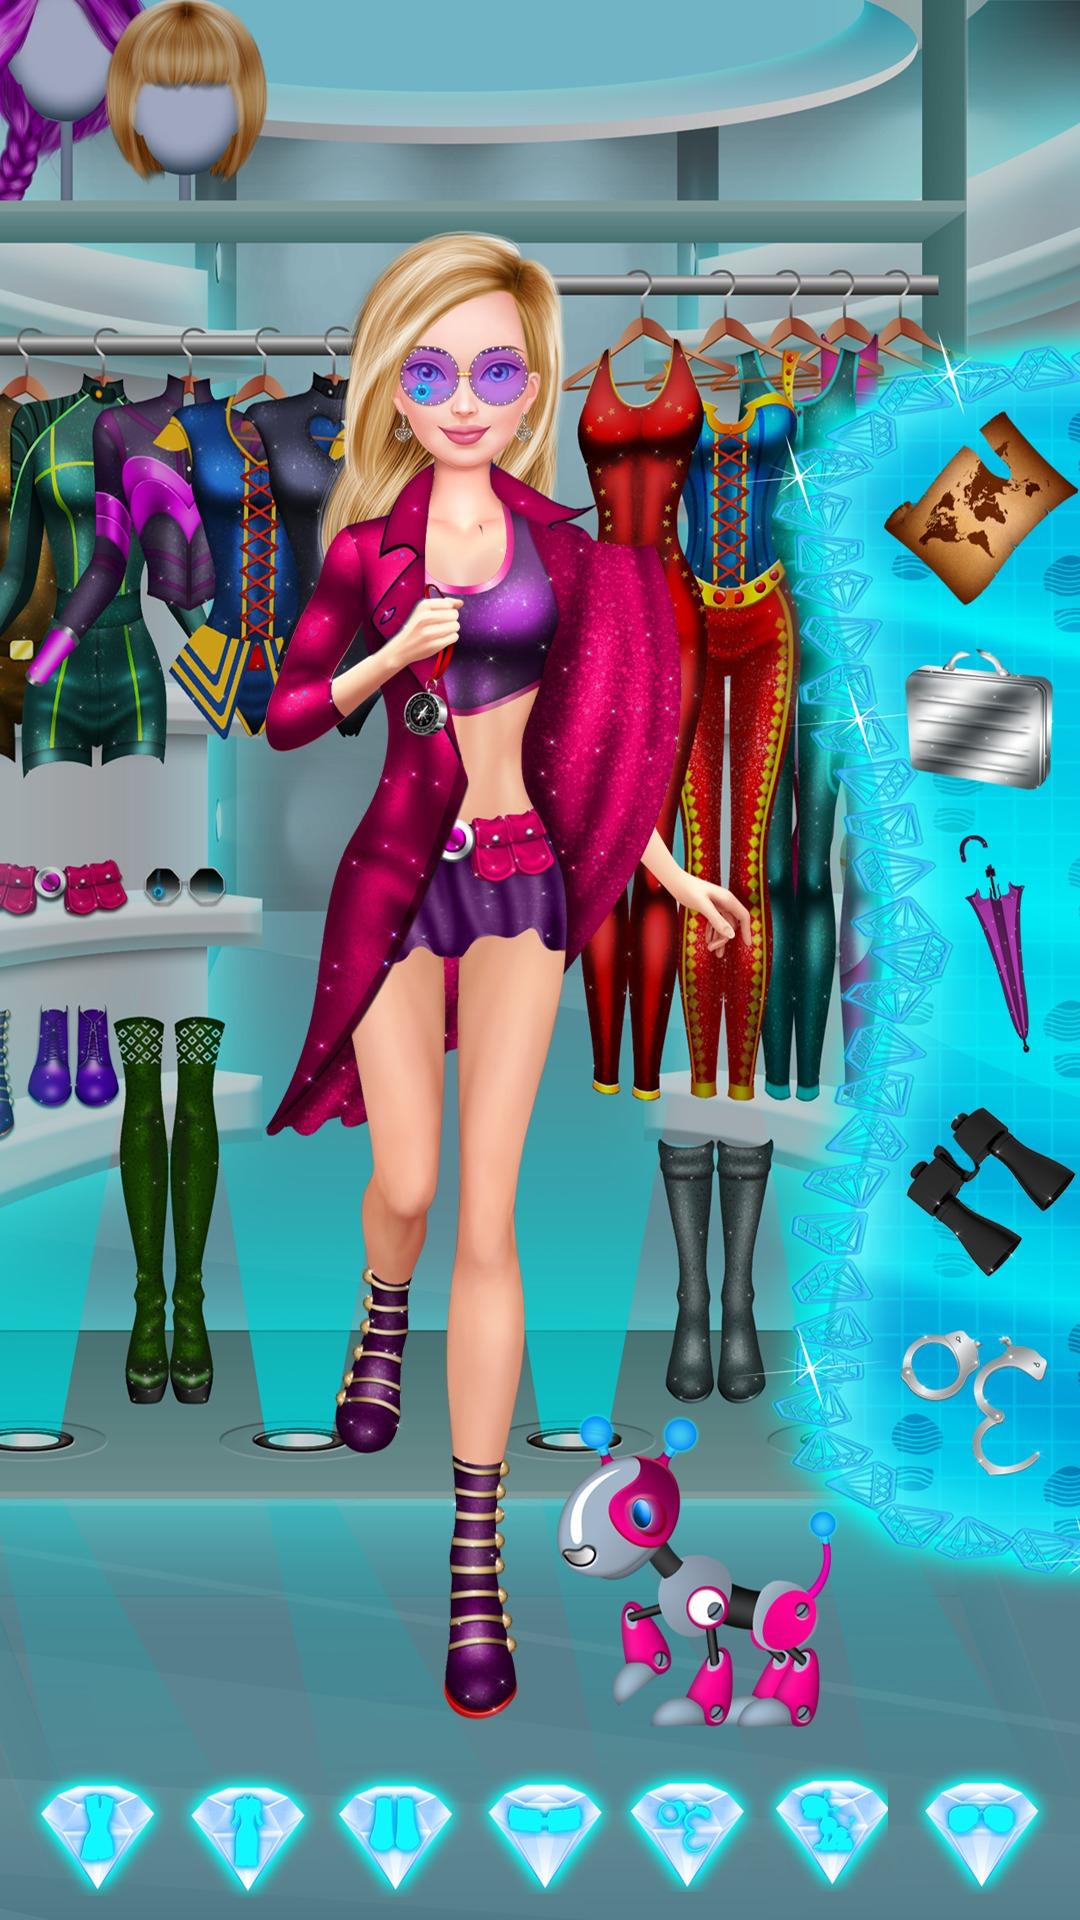 Amazon Com Spy Girl Salon Makeup And Dress Up Full Version